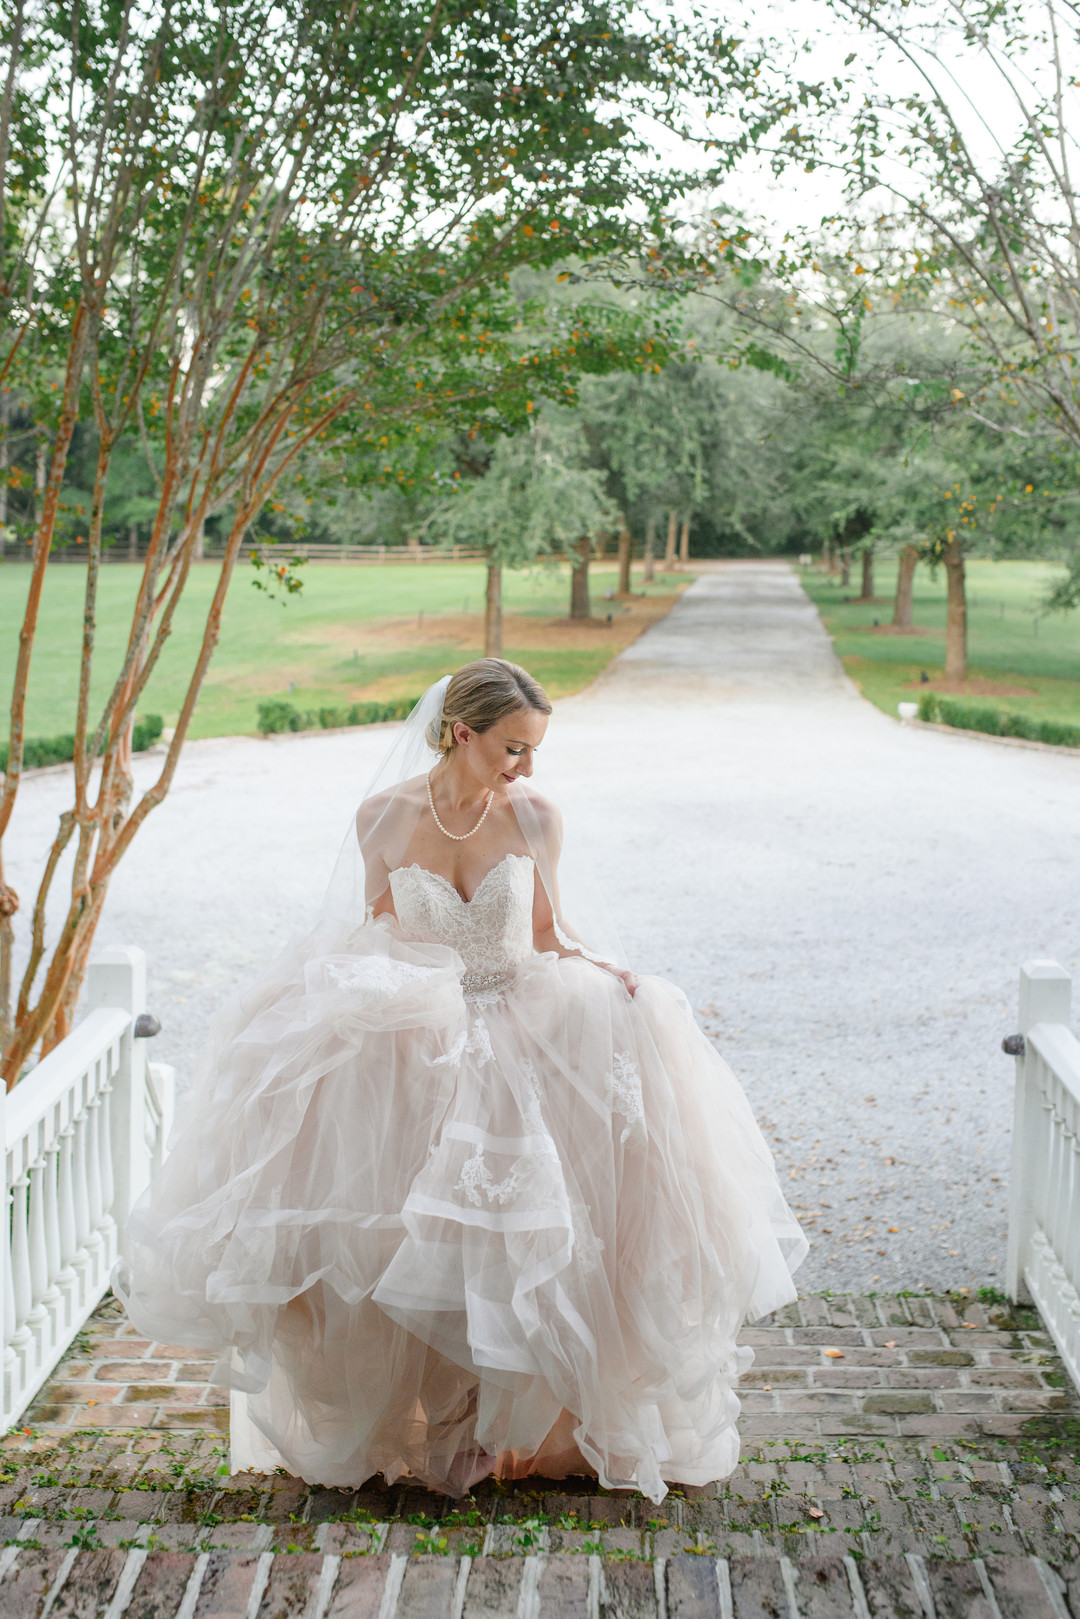 old-wide-awake-plantation-wedding-17.JPG